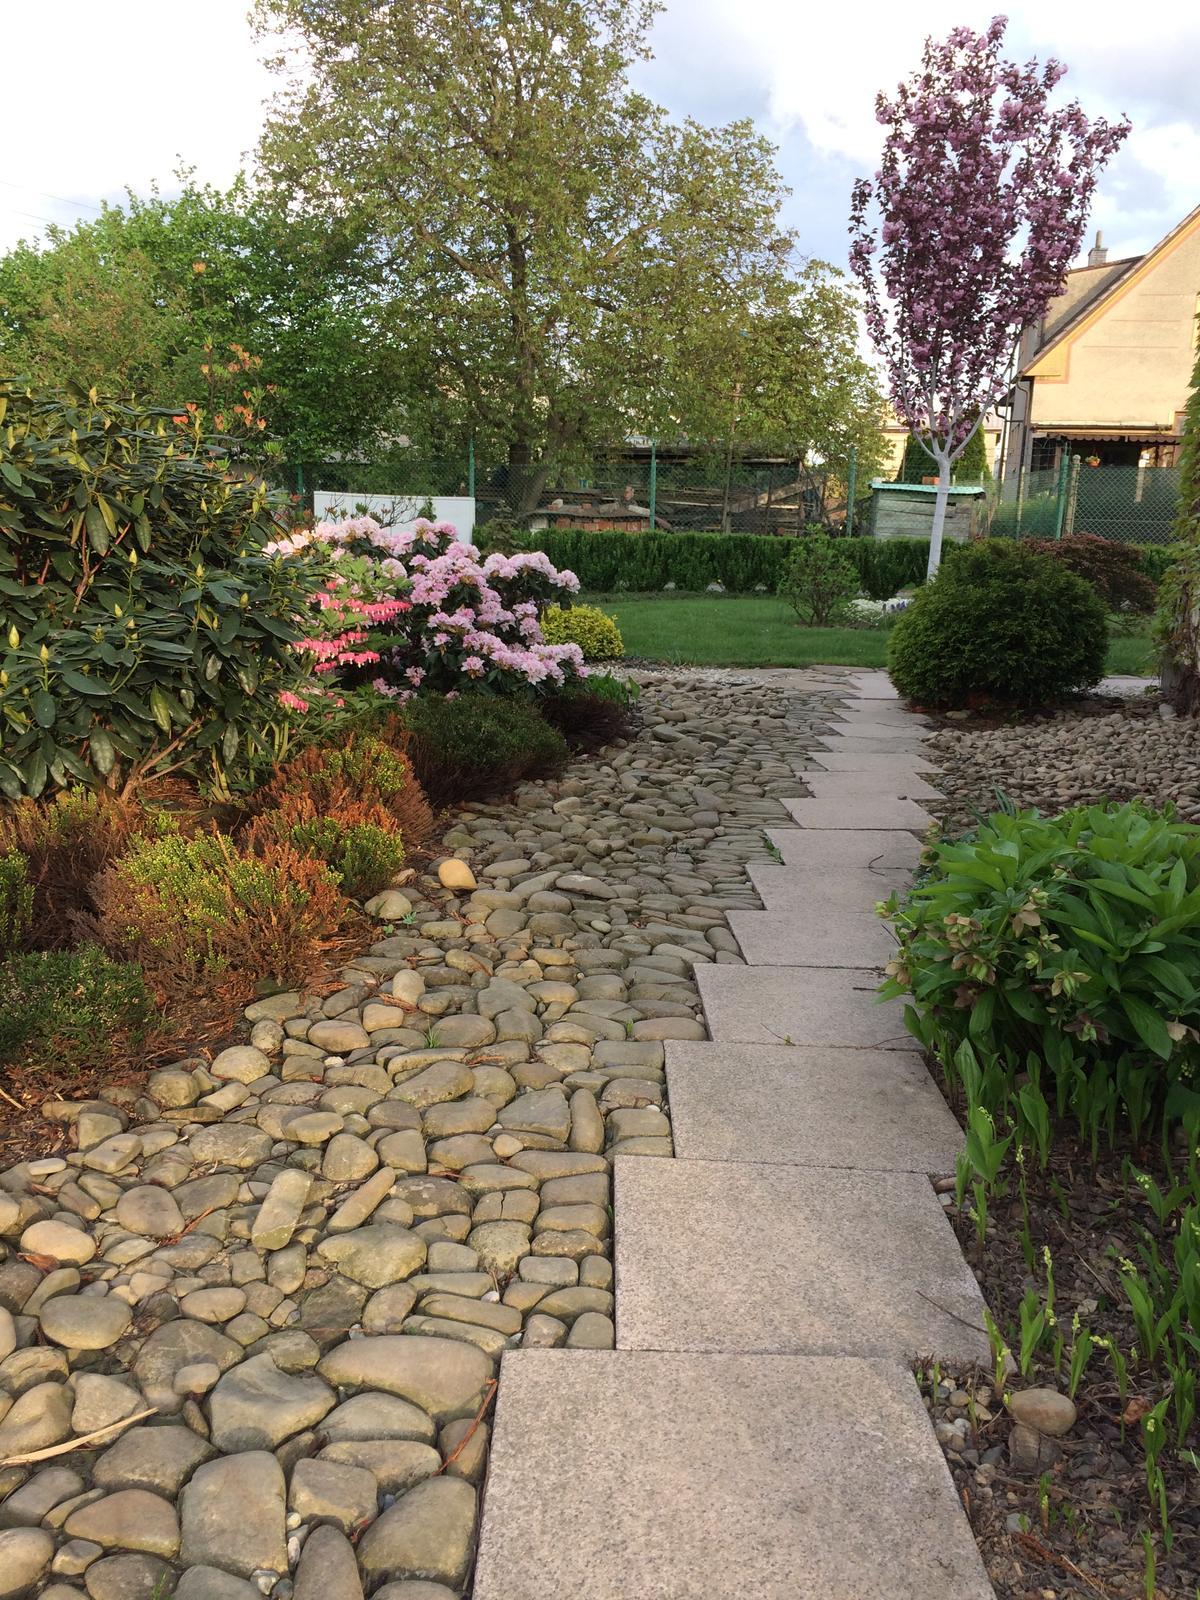 Zahrada 2018 - Záhon s rododendrony, pierisy, vřesy, konvalinkami.....severovýchodní strana domu